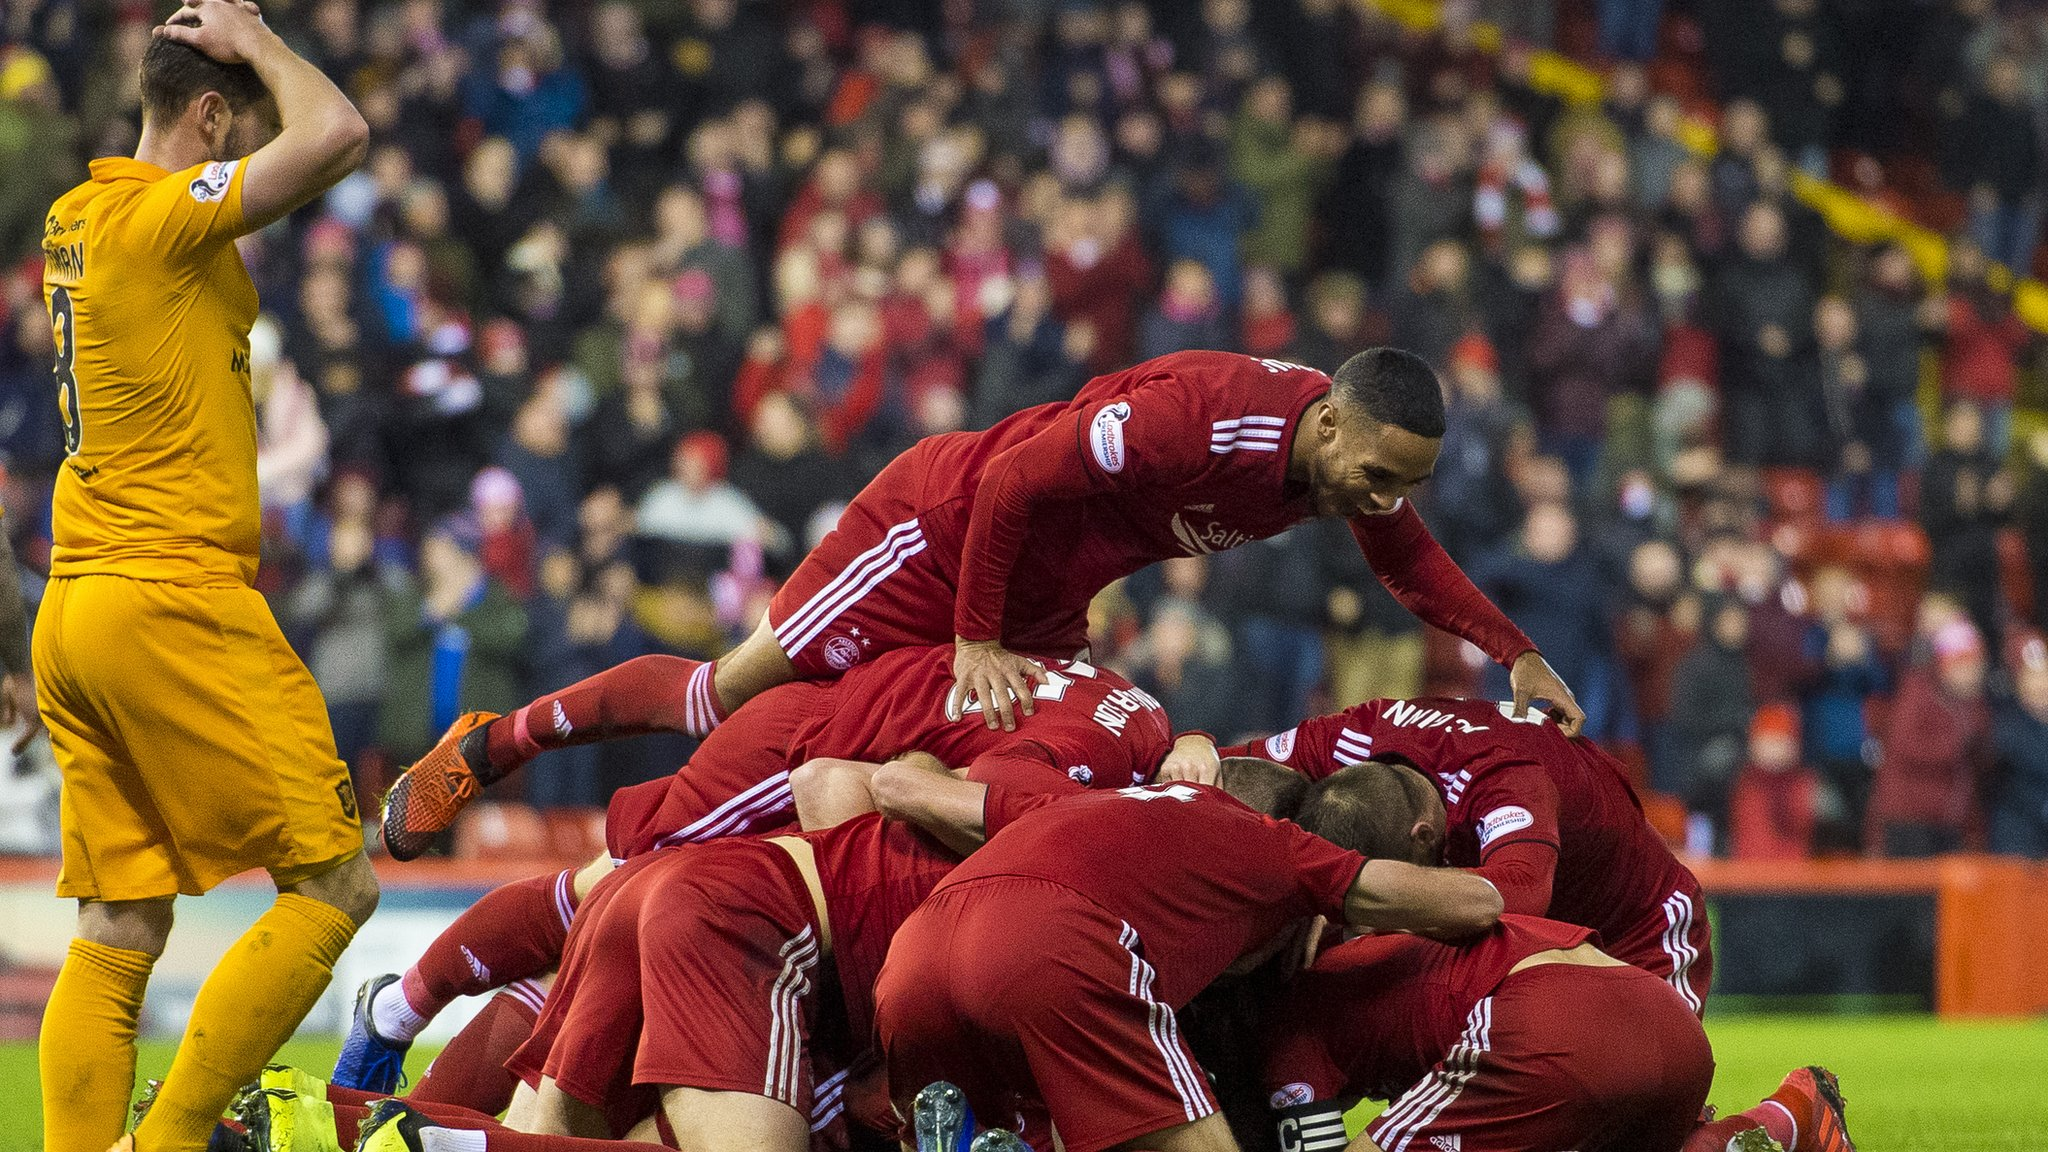 Ferguson overhead kick gives Aberdeen injury-time win over Livingston